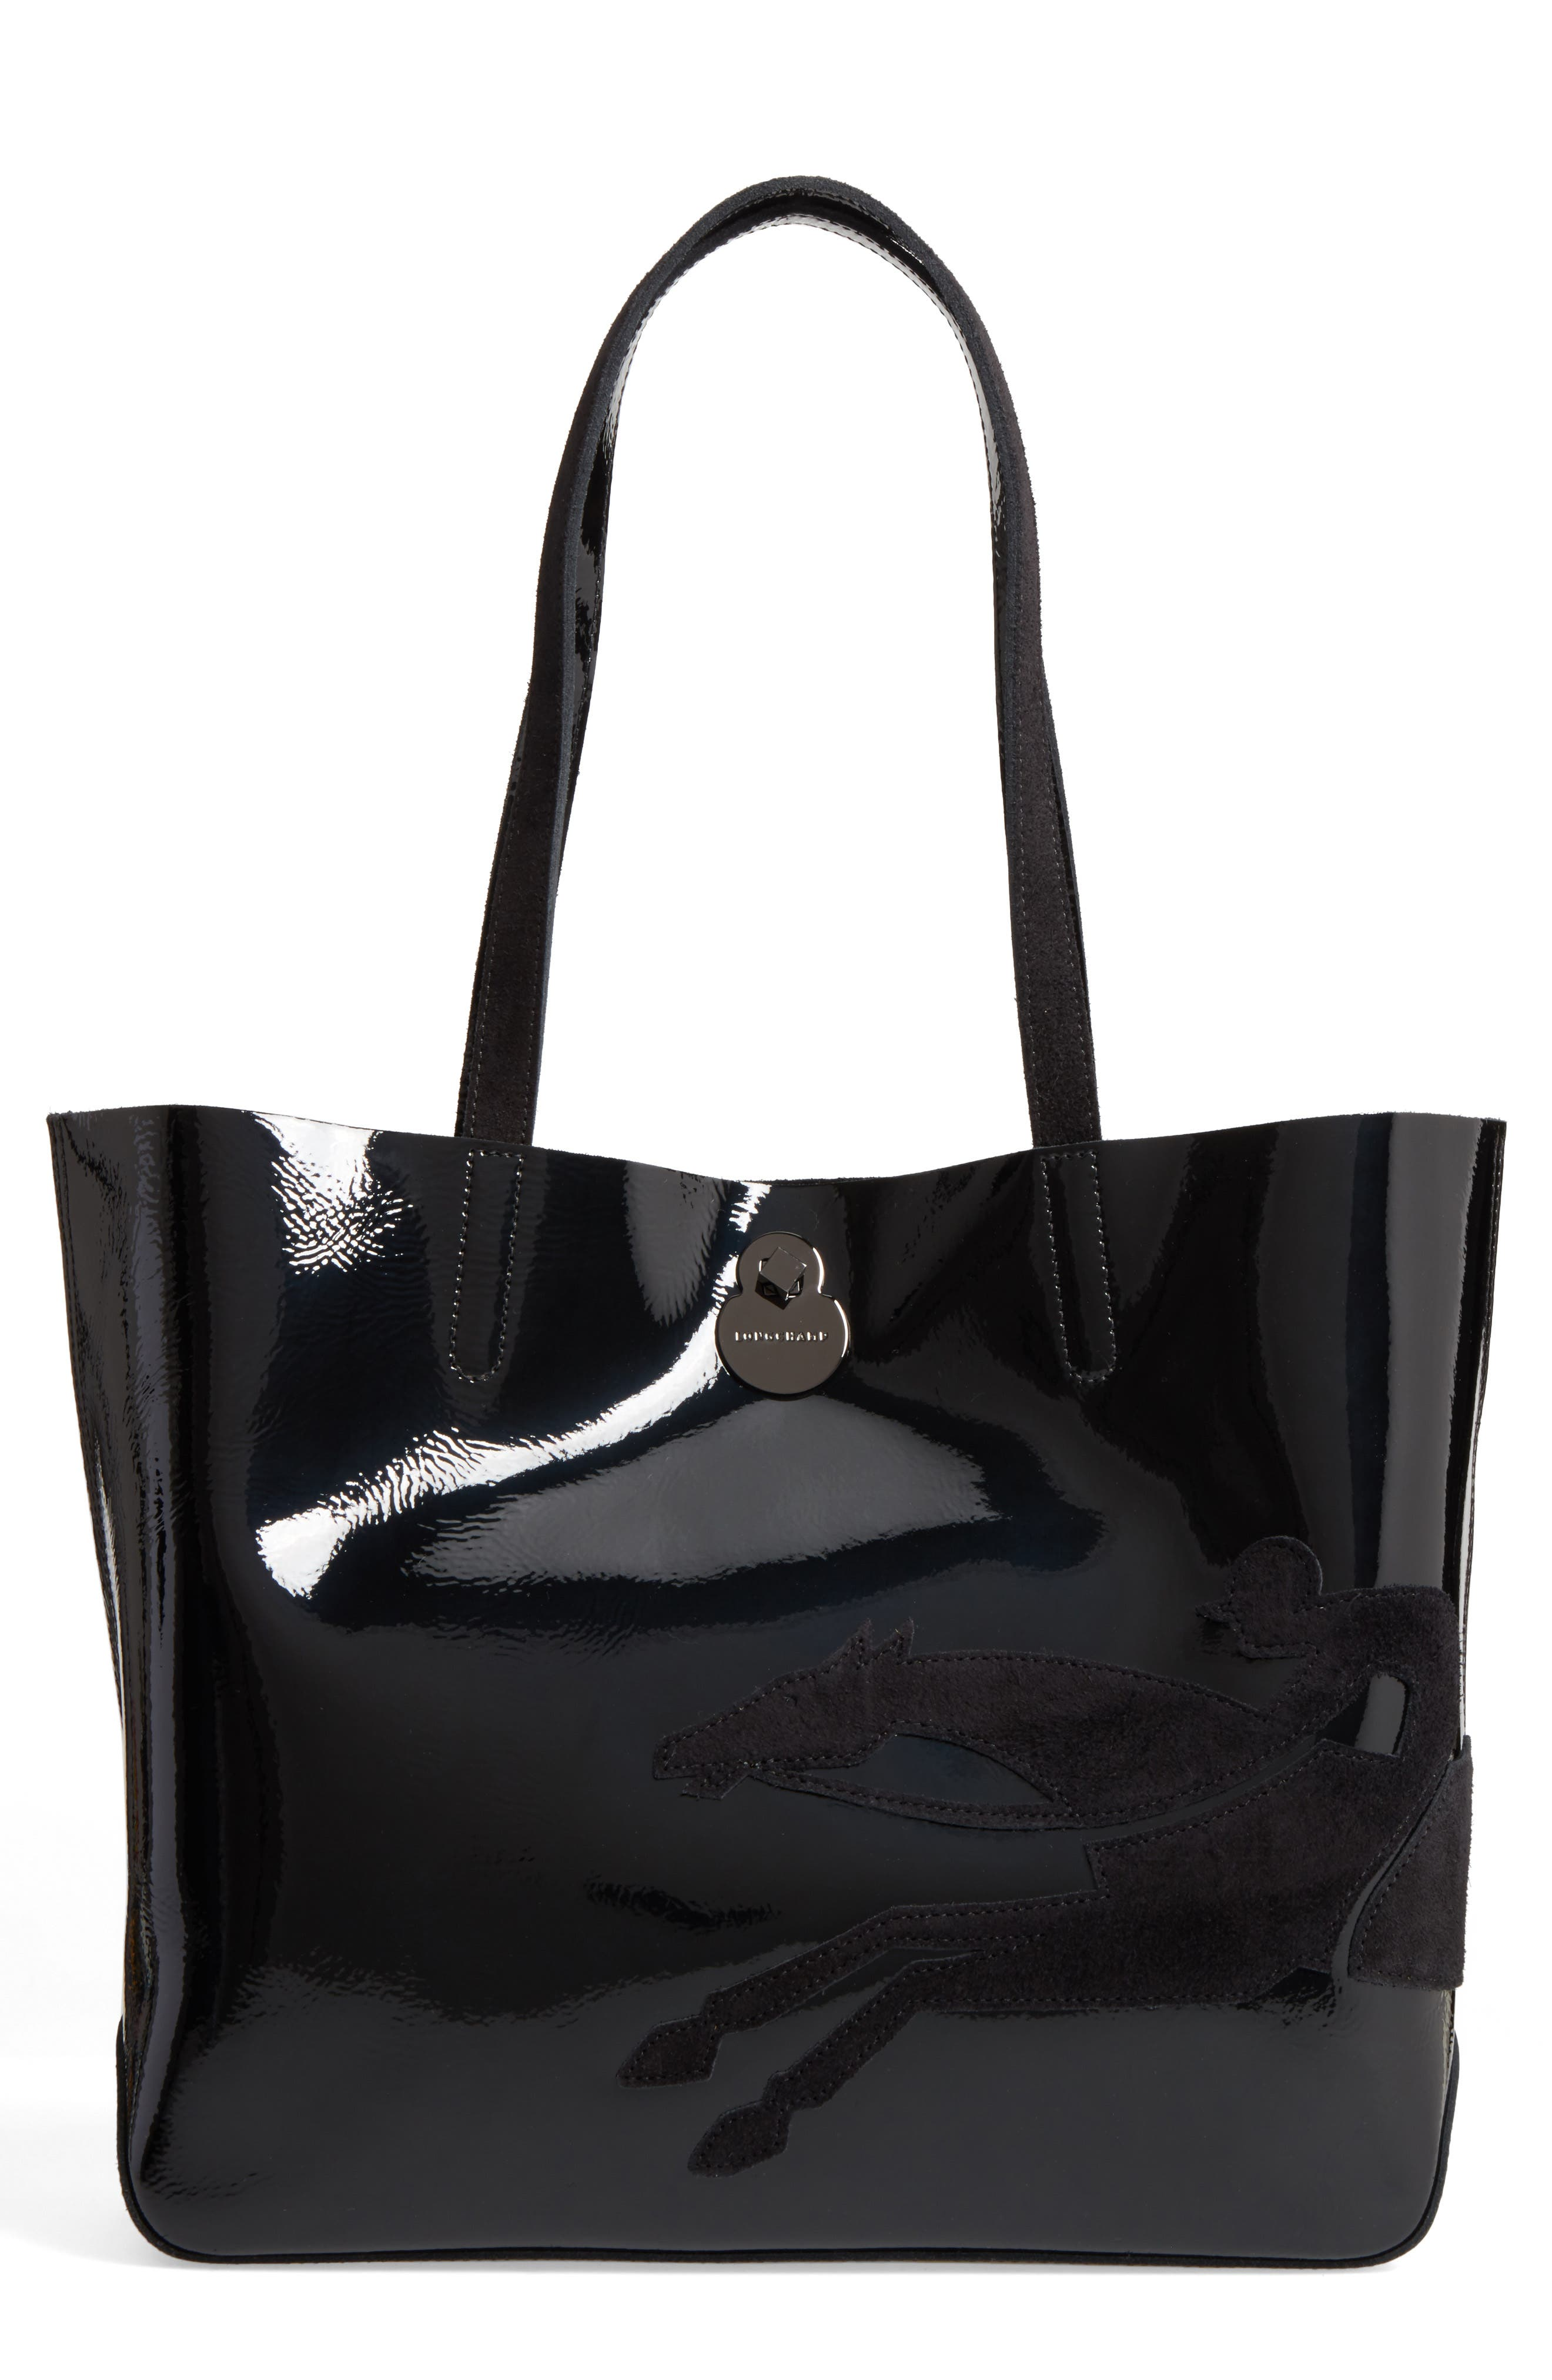 Shop-It Leather Tote,                         Main,                         color, 001